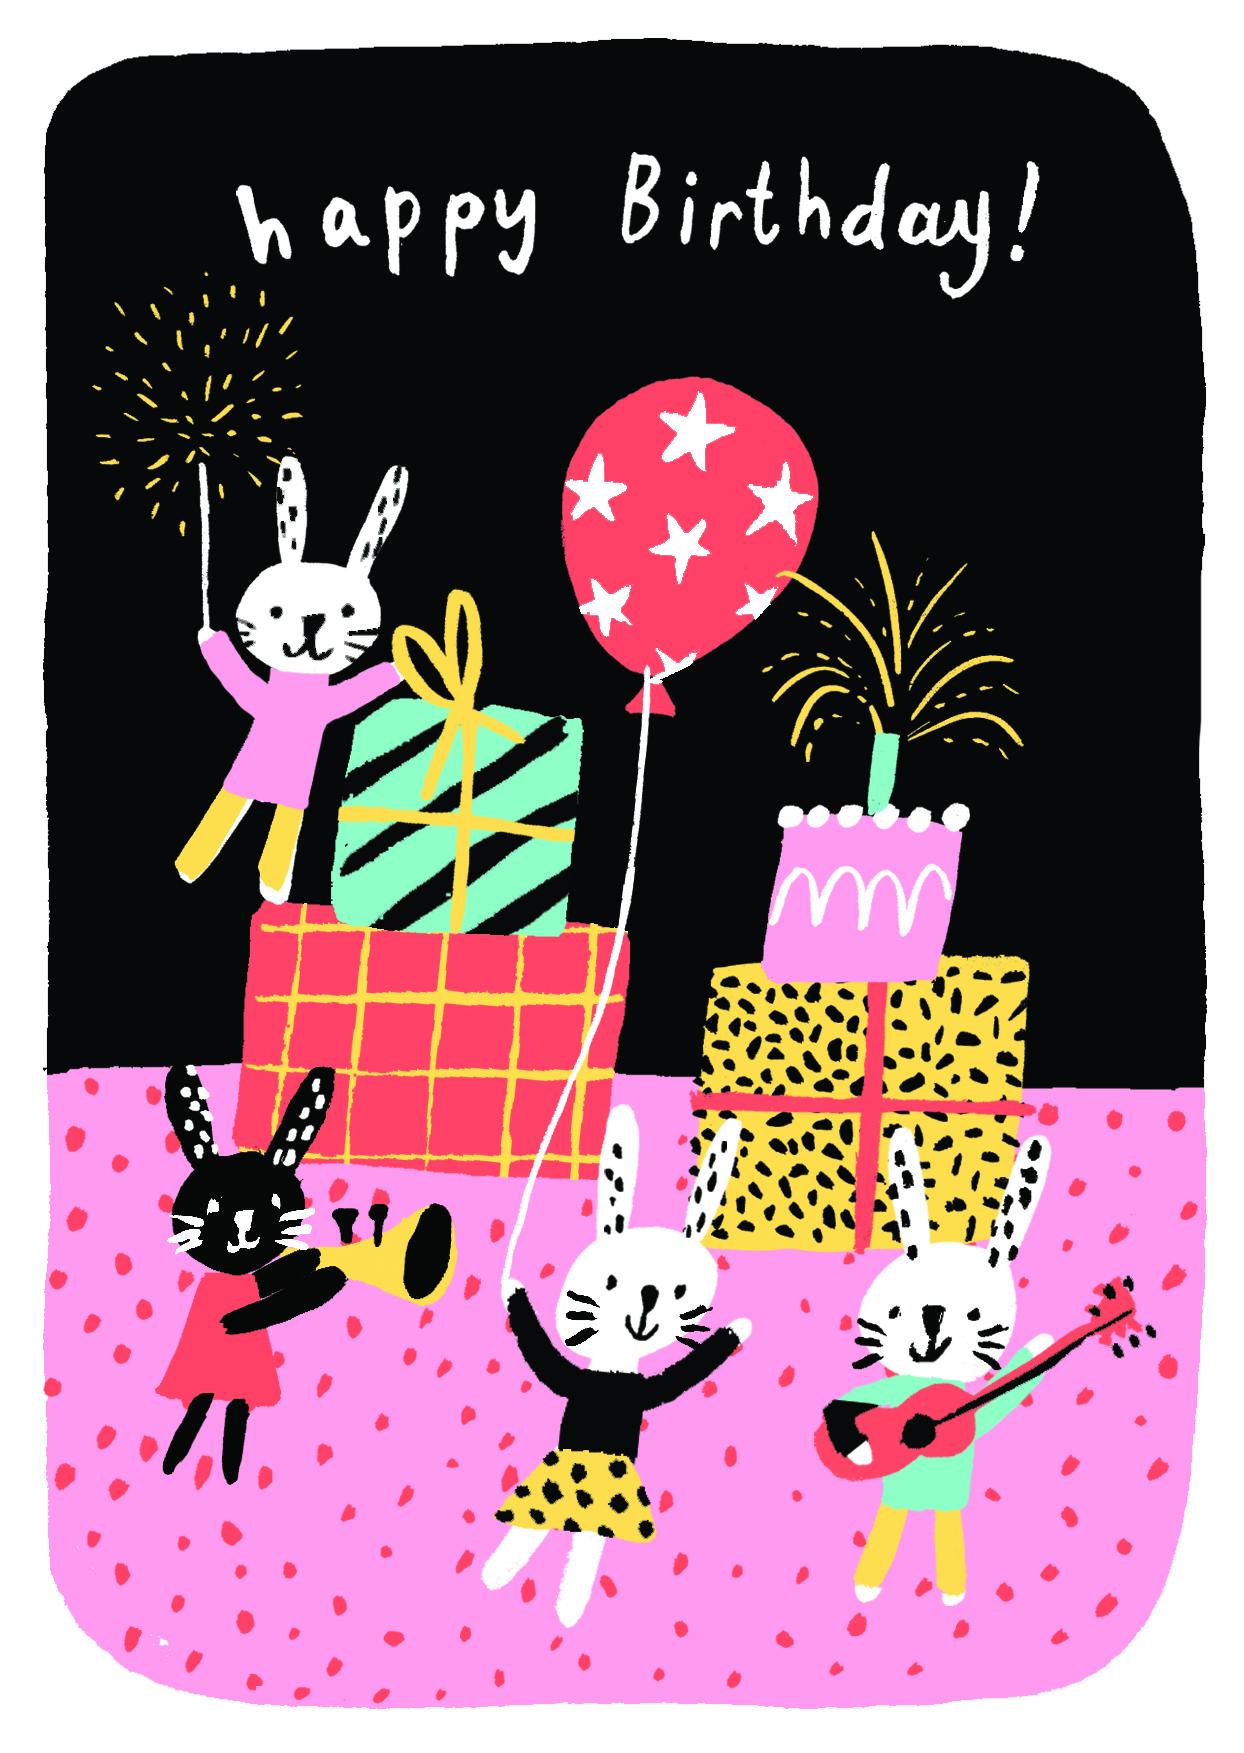 04.birthday party card.jpg